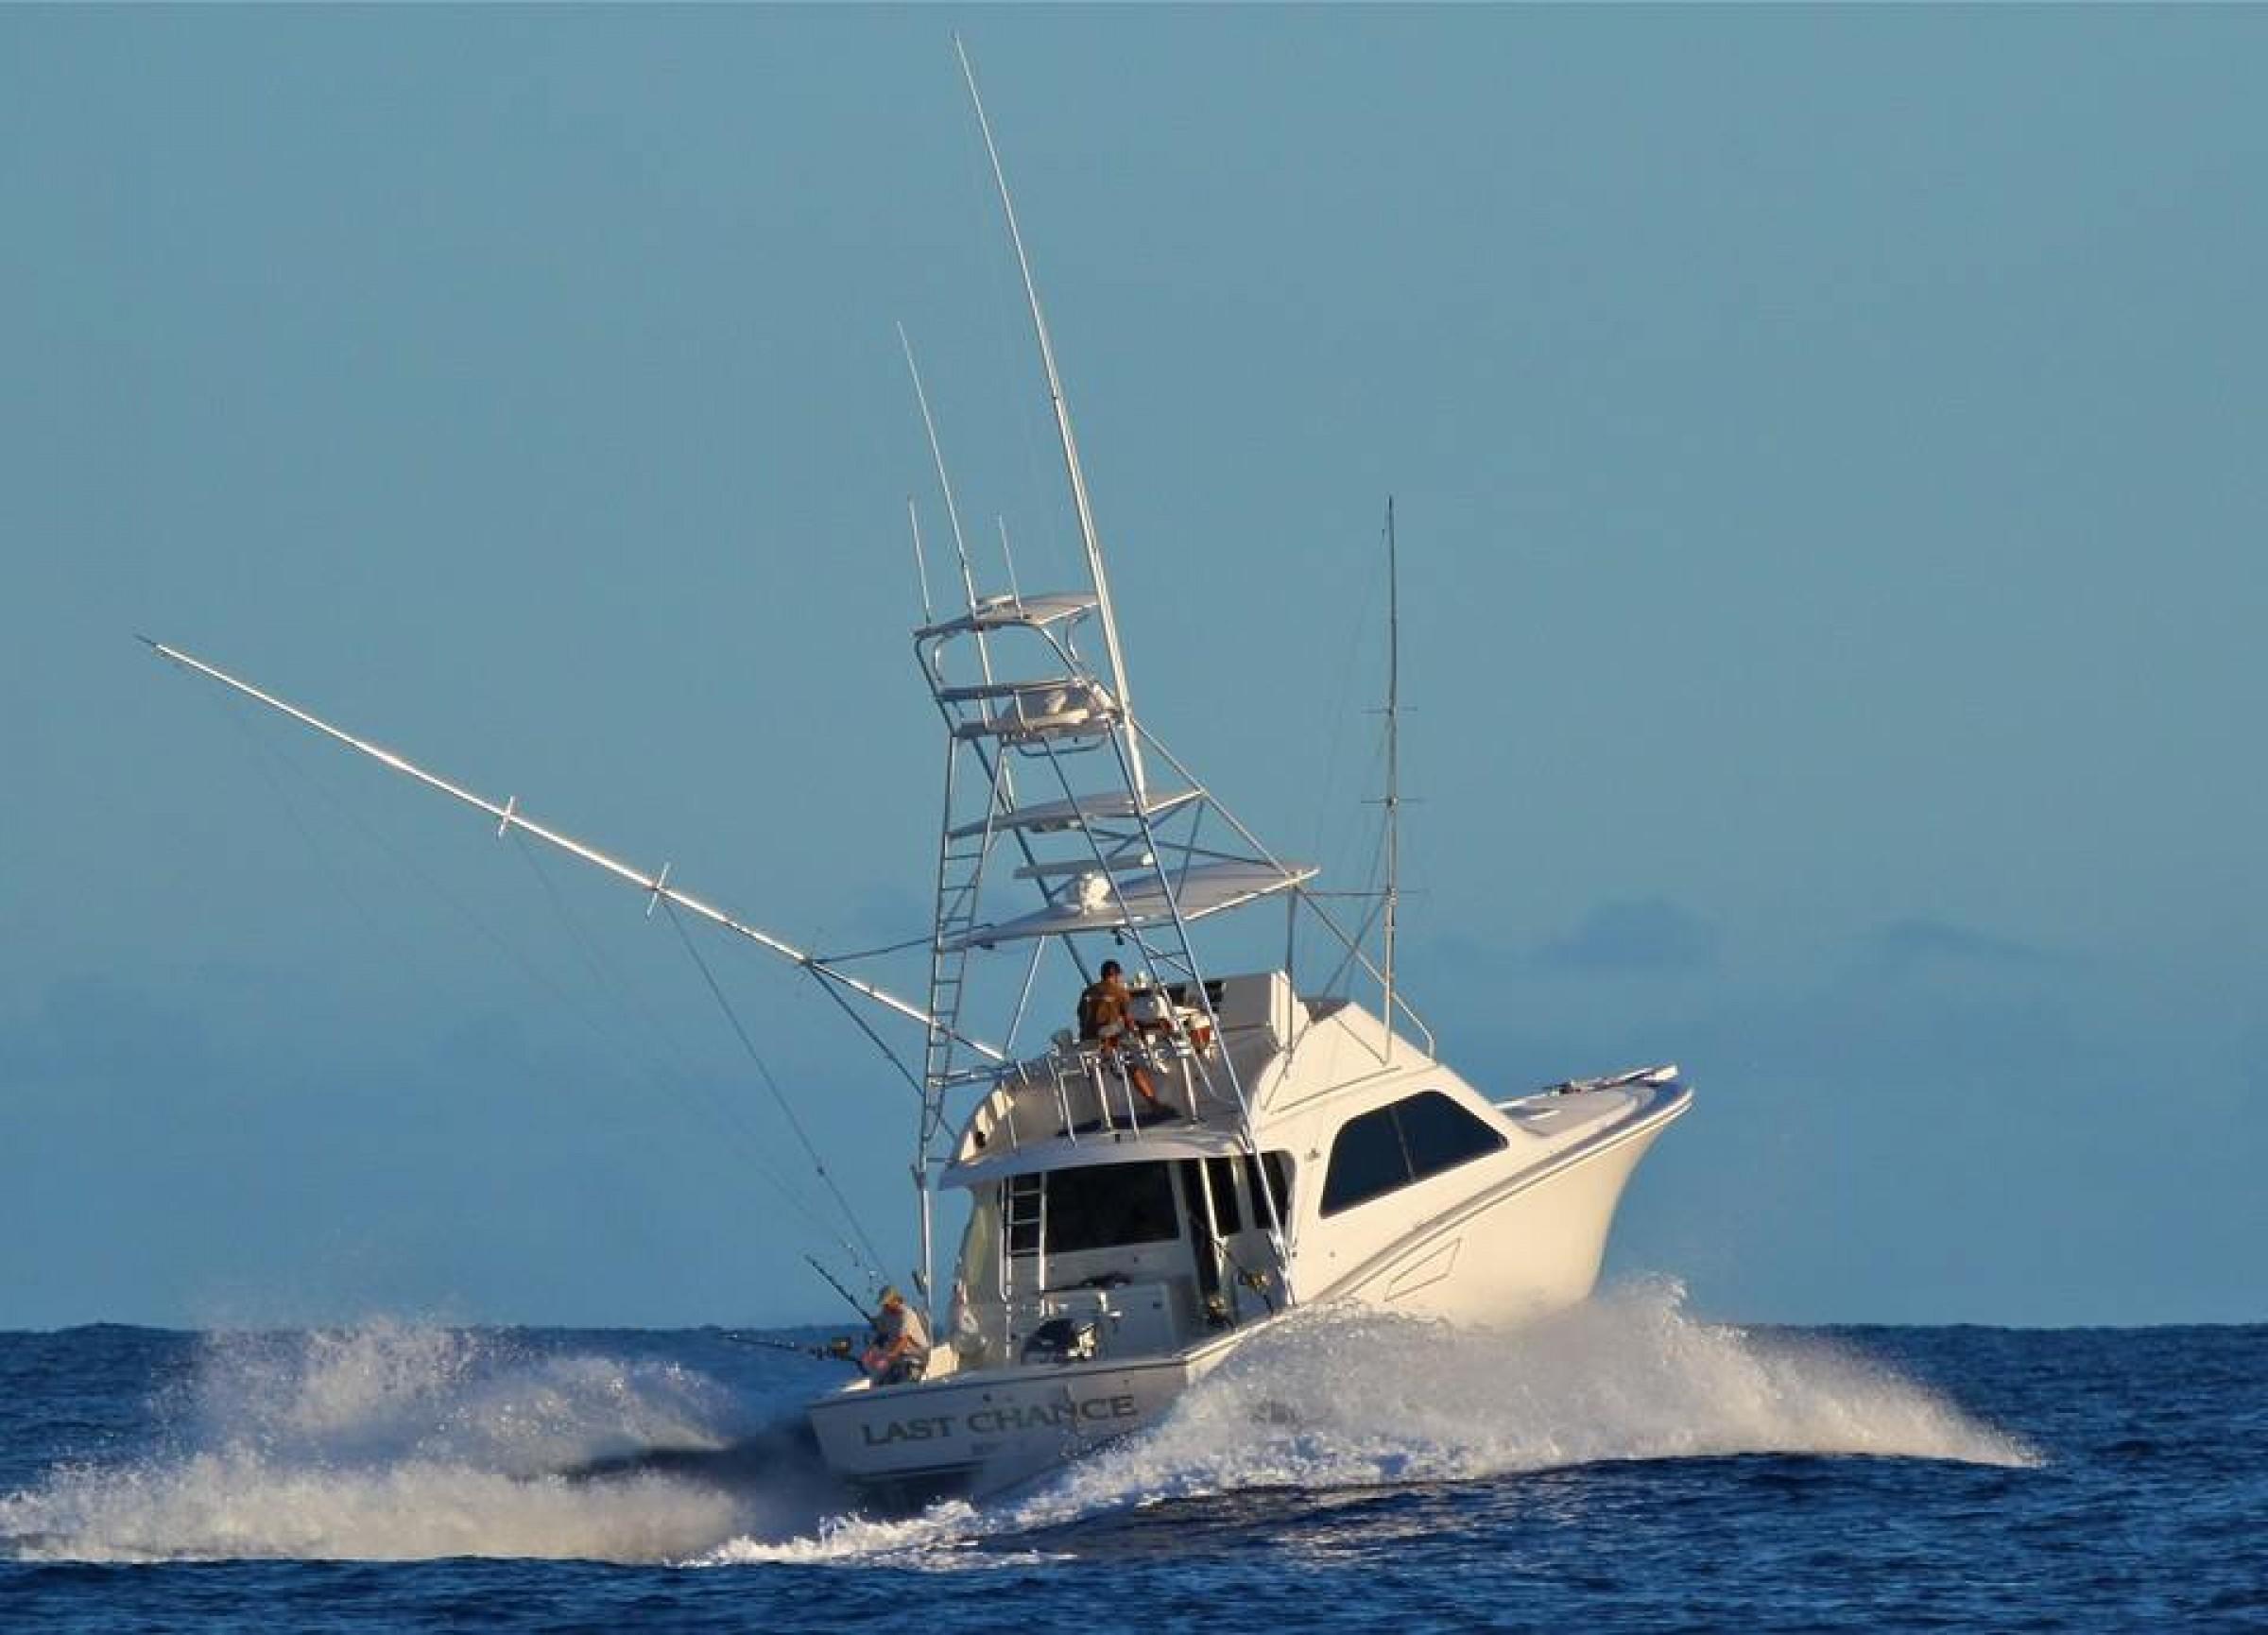 Last Chance Sport Fishing